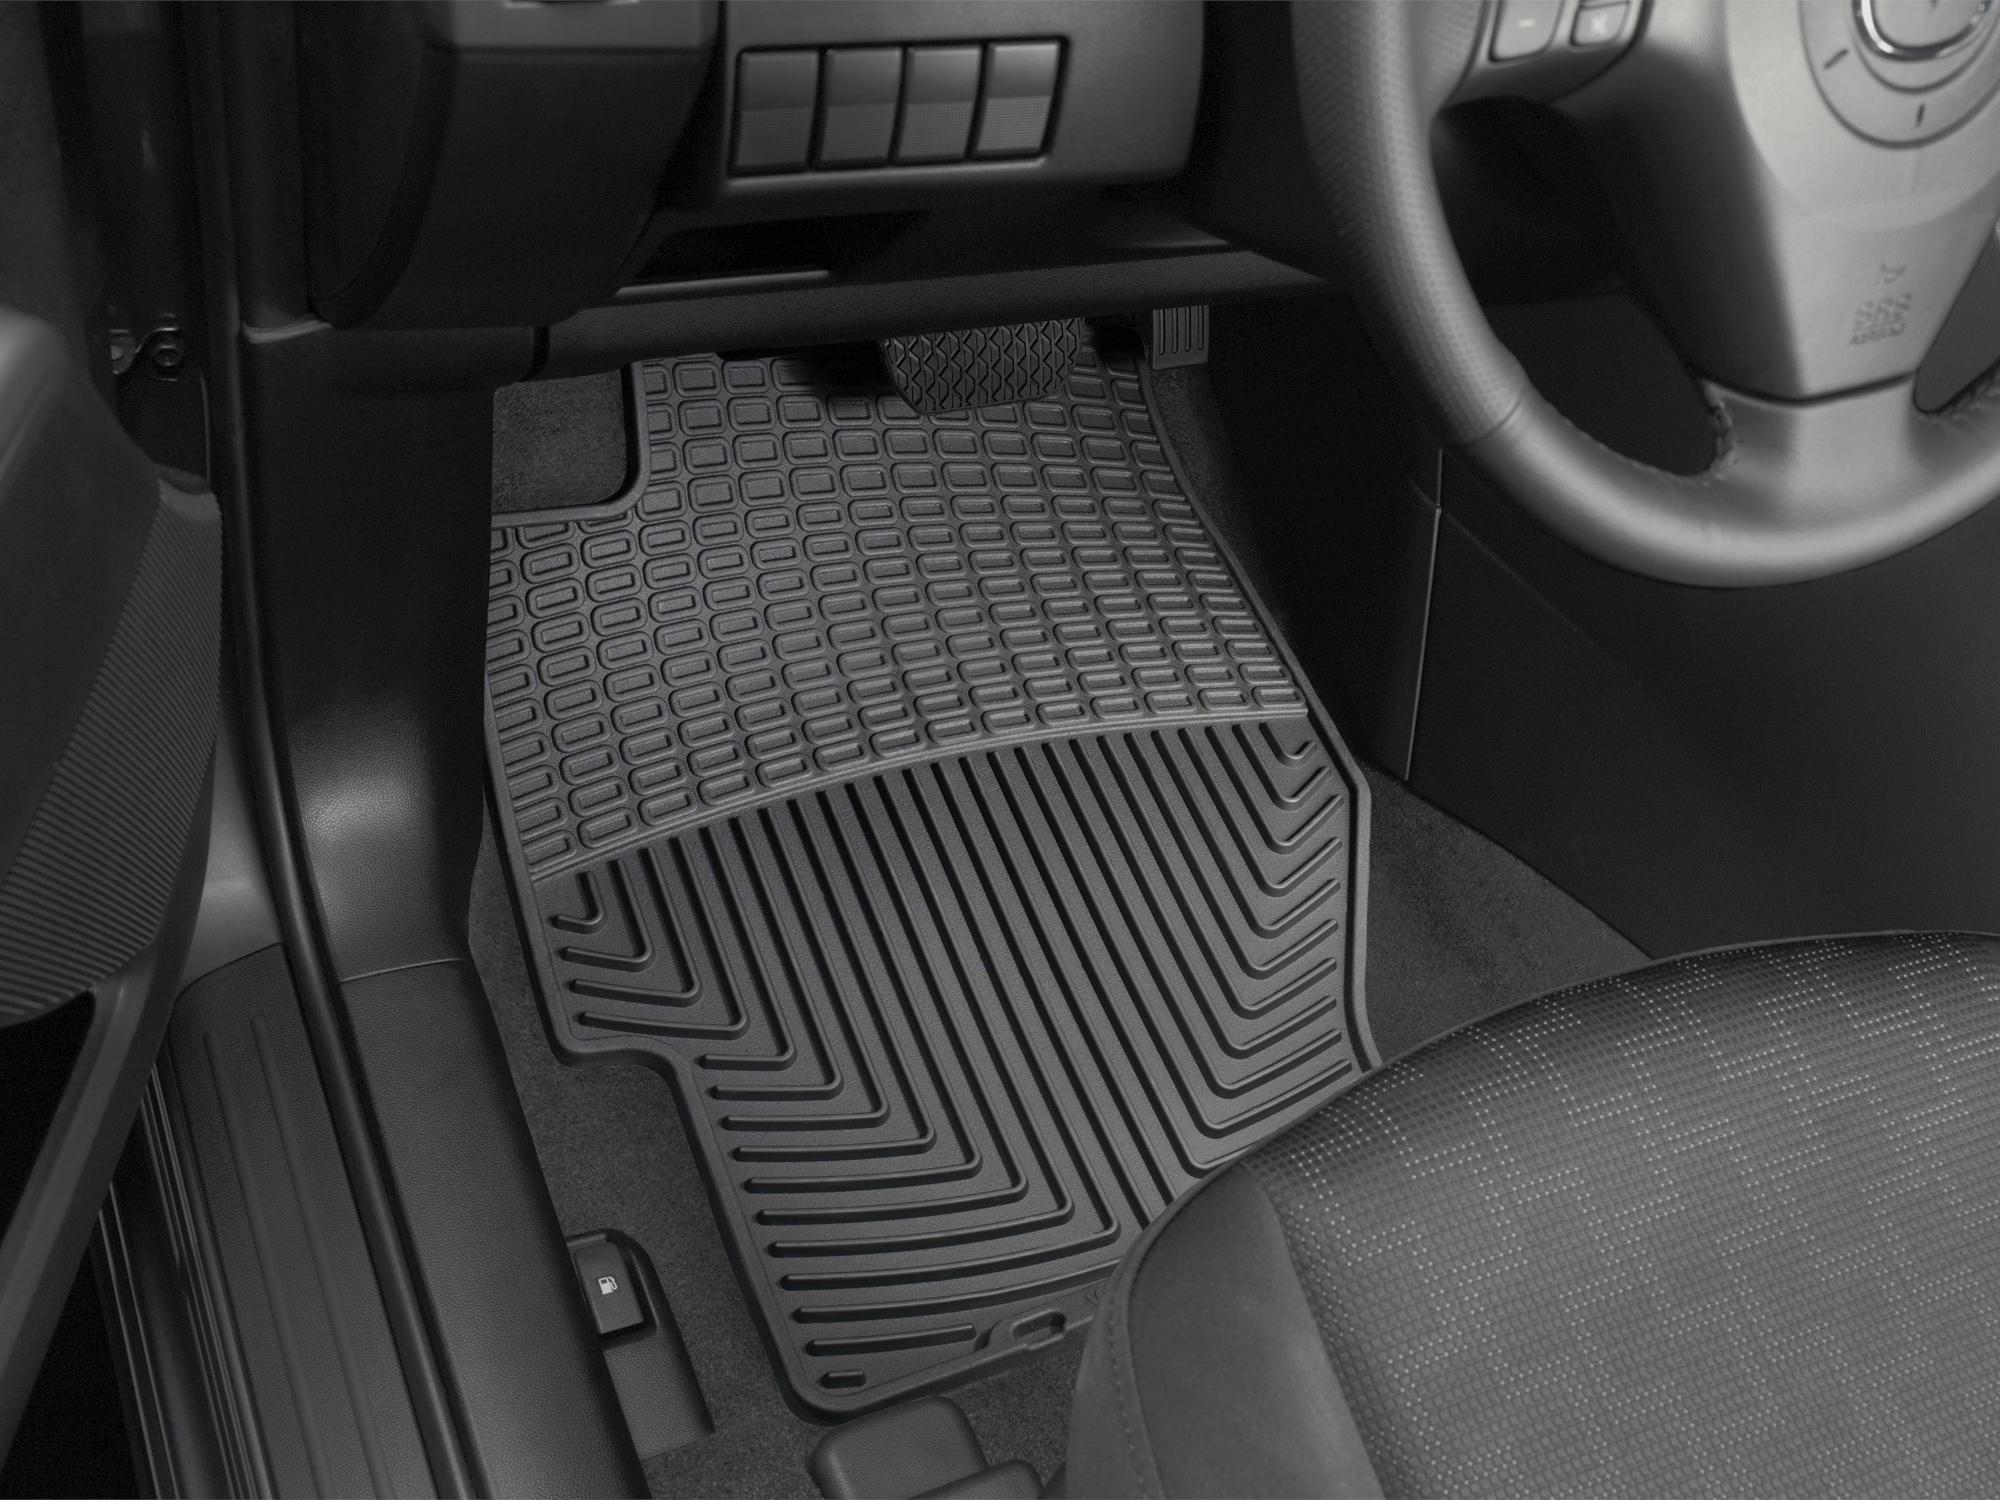 Acura RSX AVM HD Floor Mats Heavy Duty Flexible Trim To Fit - Acura rsx floor mats